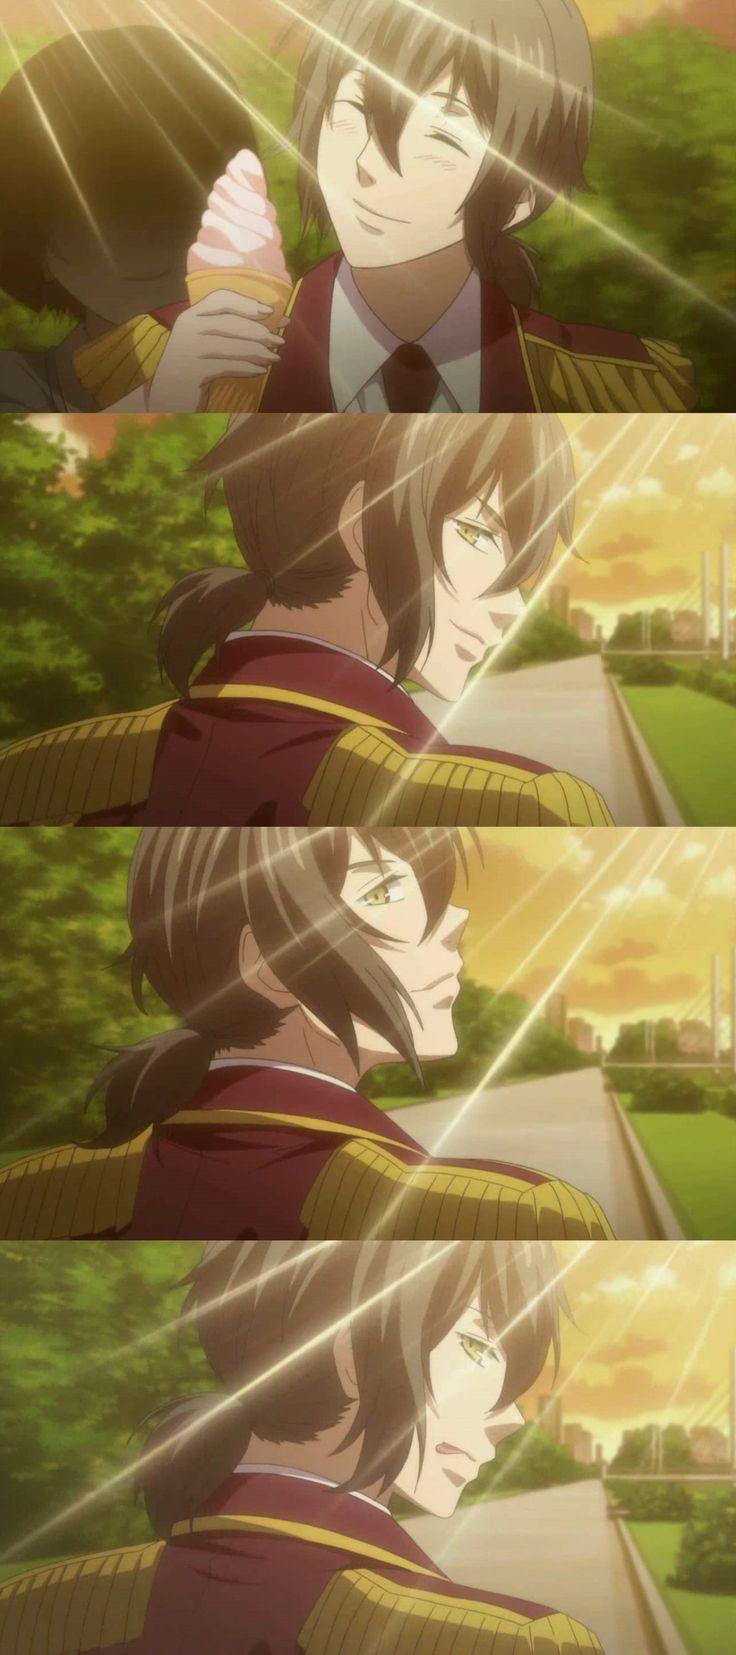 #King of prism #Over the rainbow #Mihama Kouji #킹오브프리즘 #오버더레인보우 #미하마 코우지